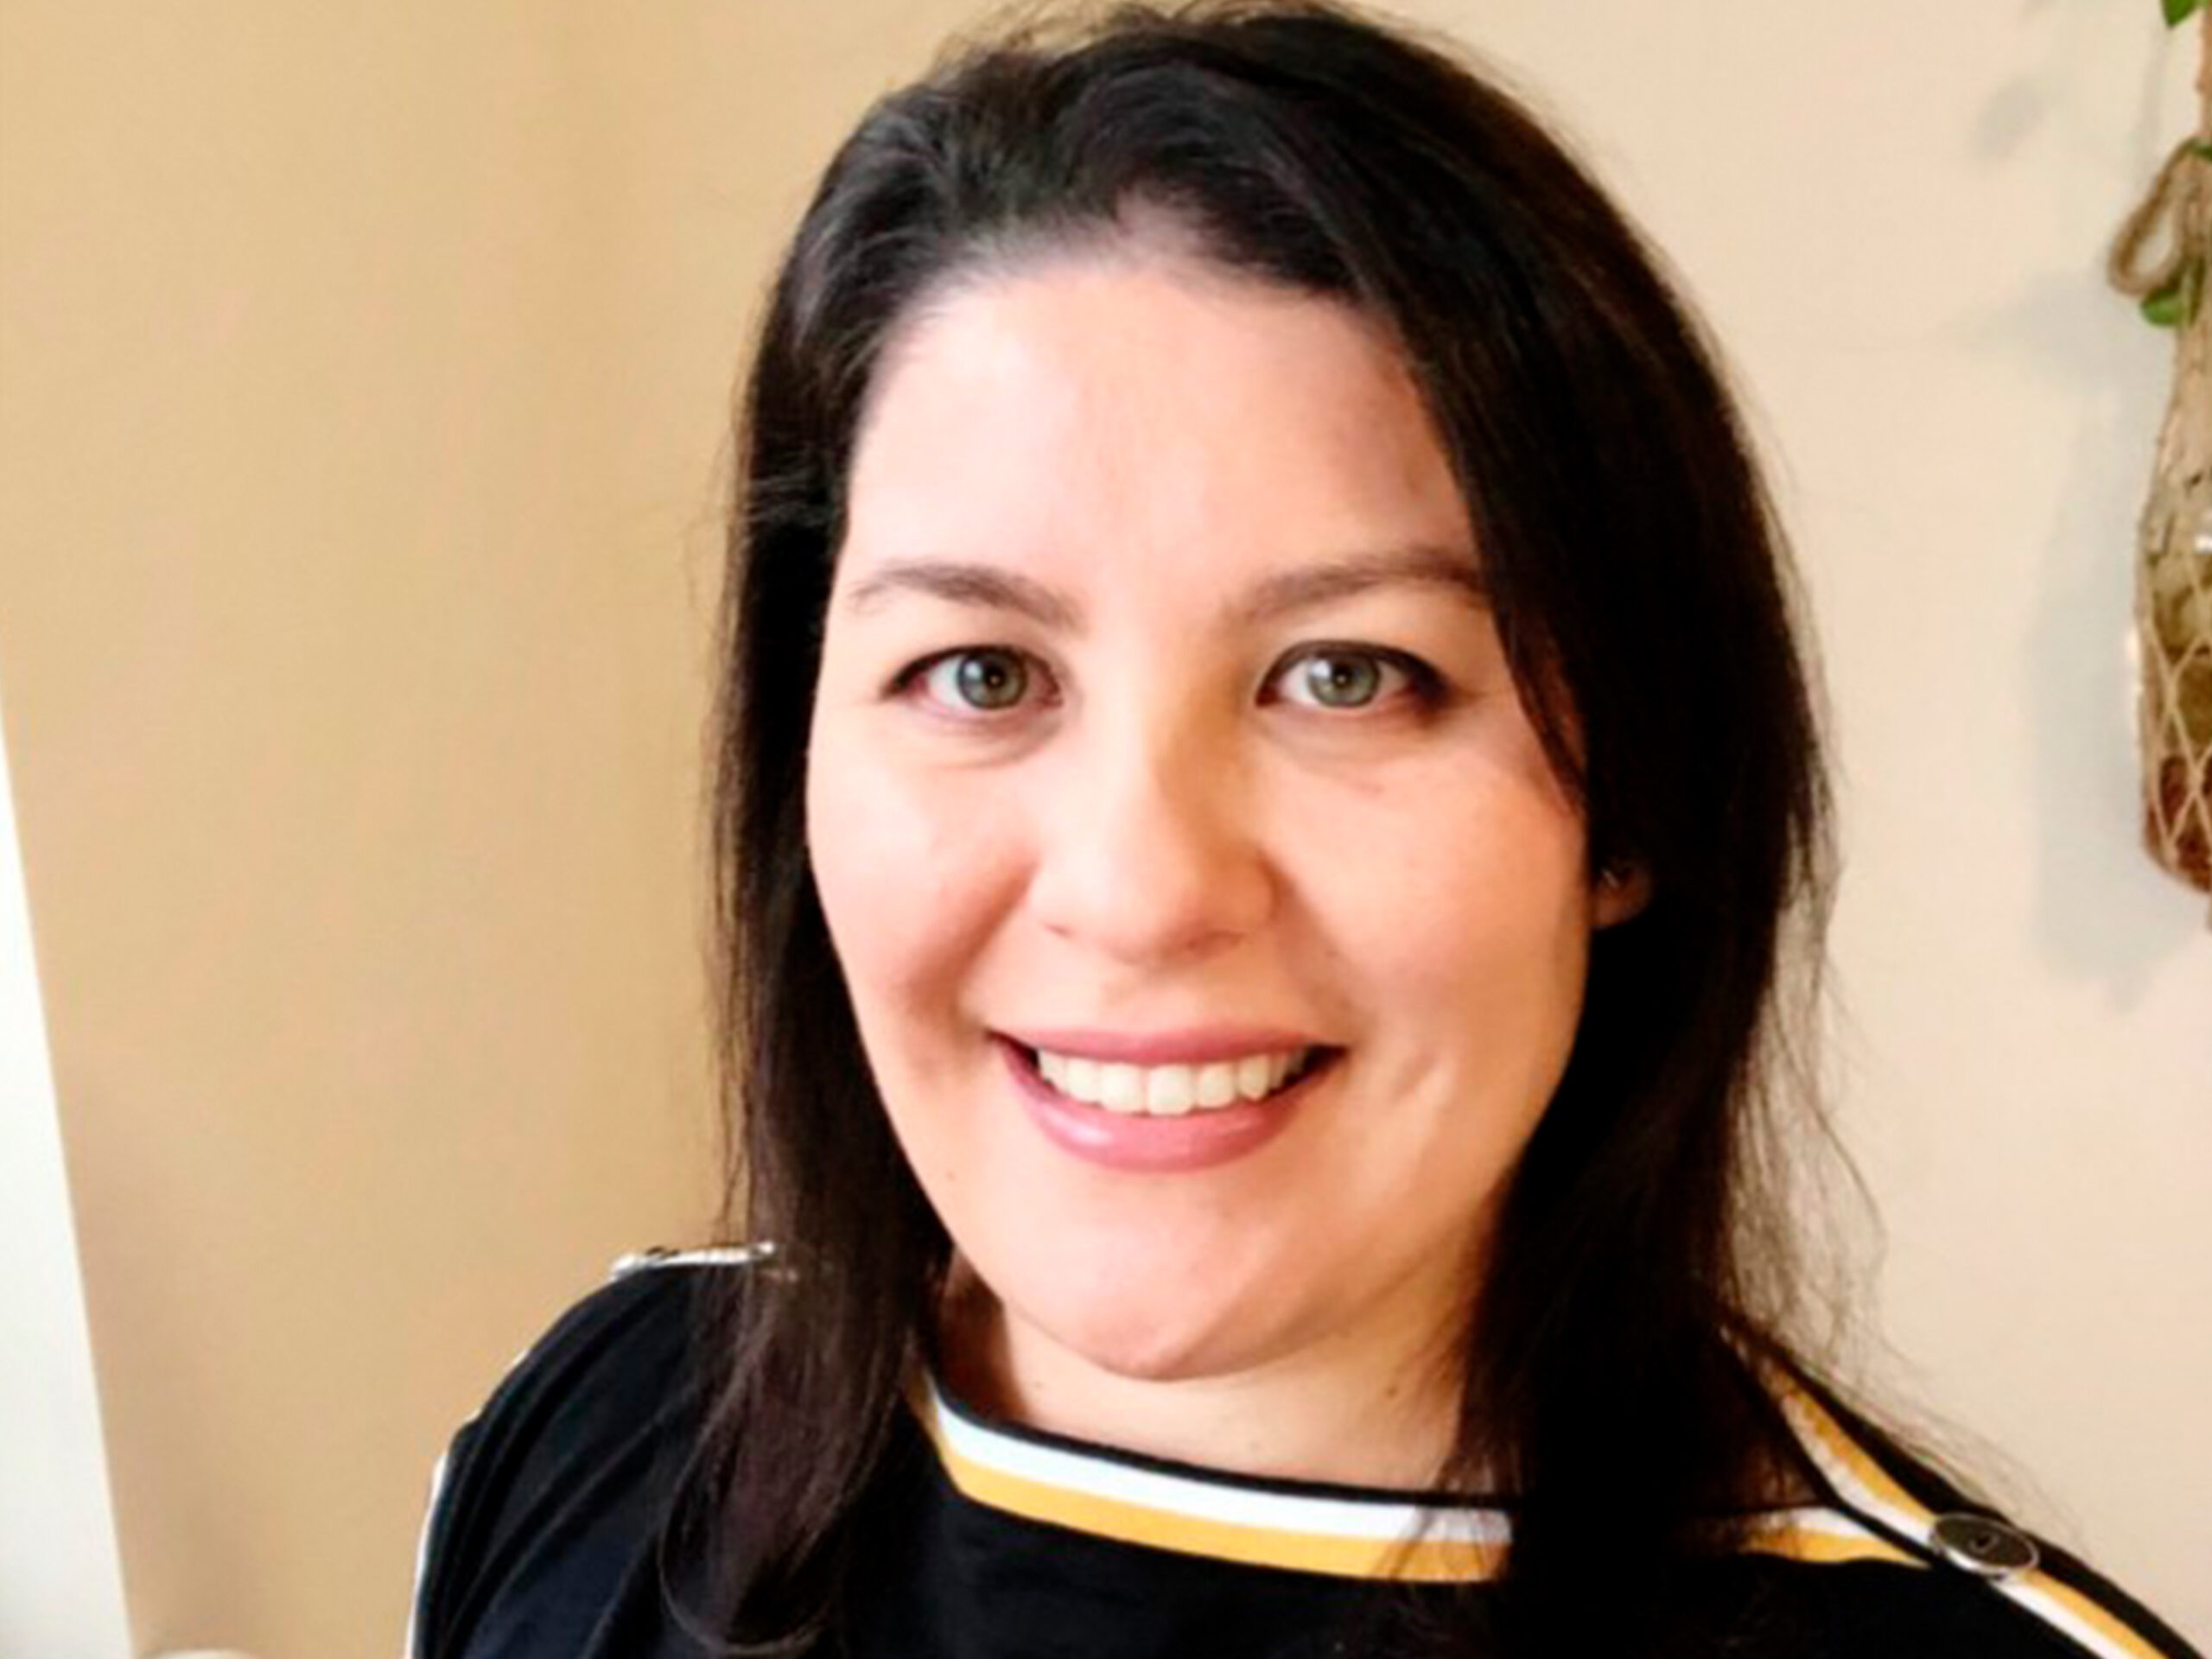 Carolina Leseigneur